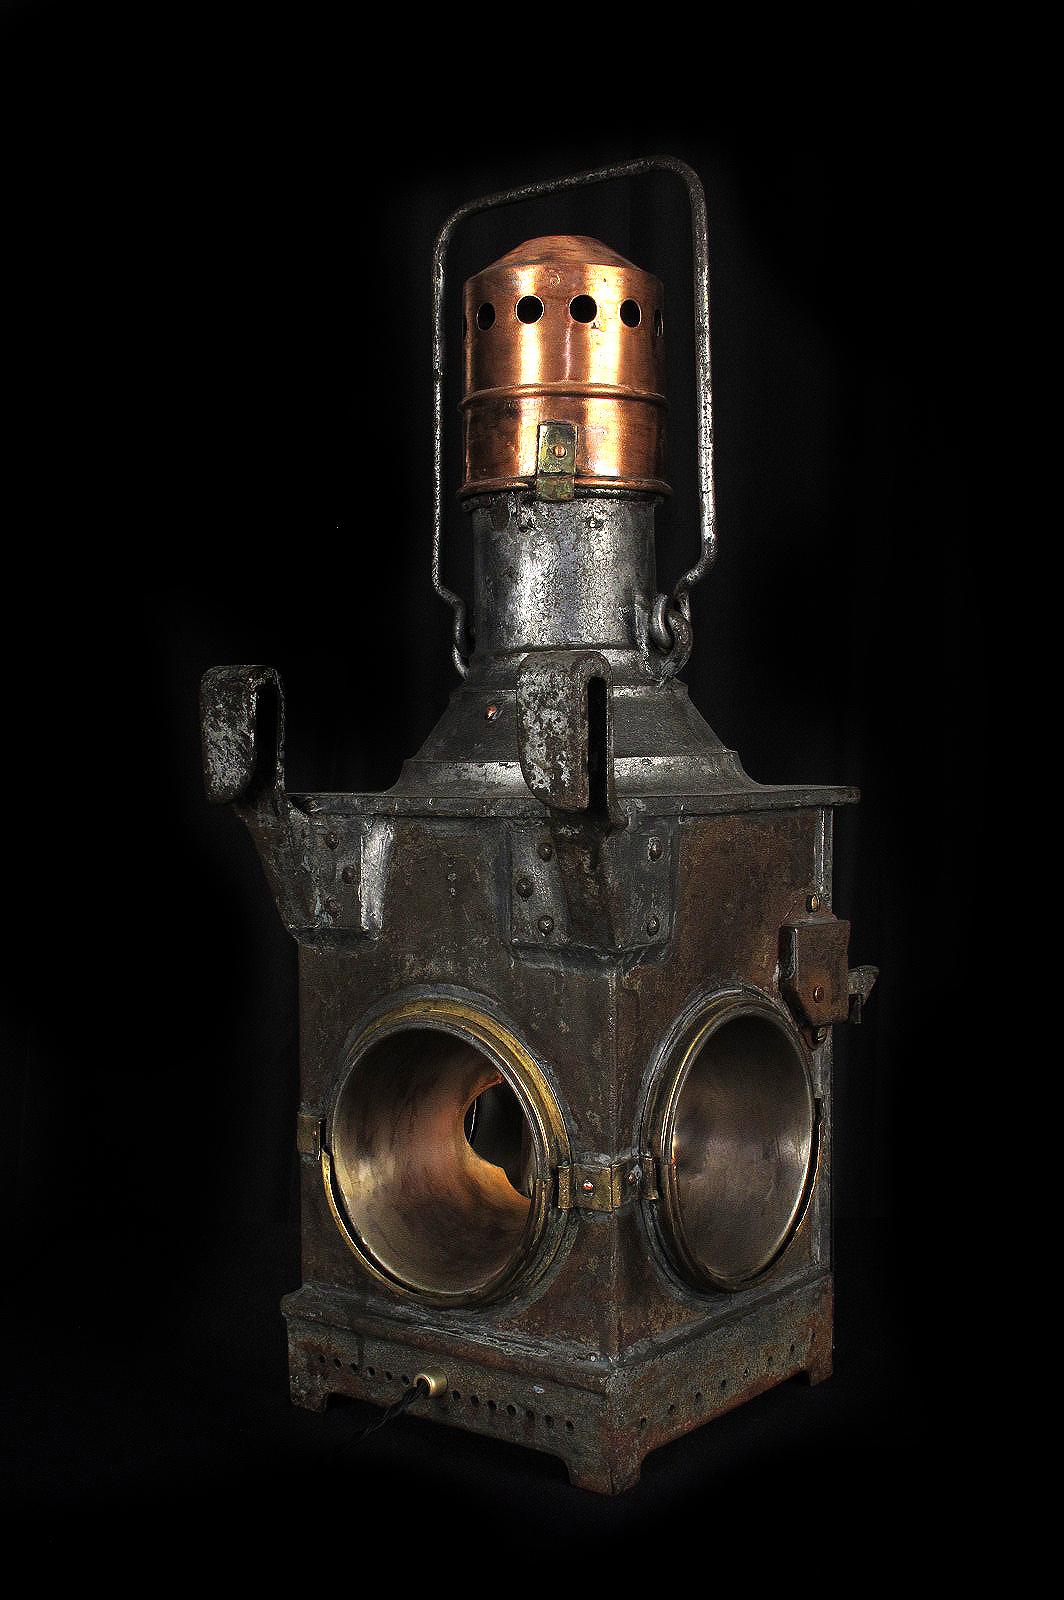 lanterne ancienne cheminot fonte bronze cuivre 1850 decoration steampunk industriel luminaire. Black Bedroom Furniture Sets. Home Design Ideas